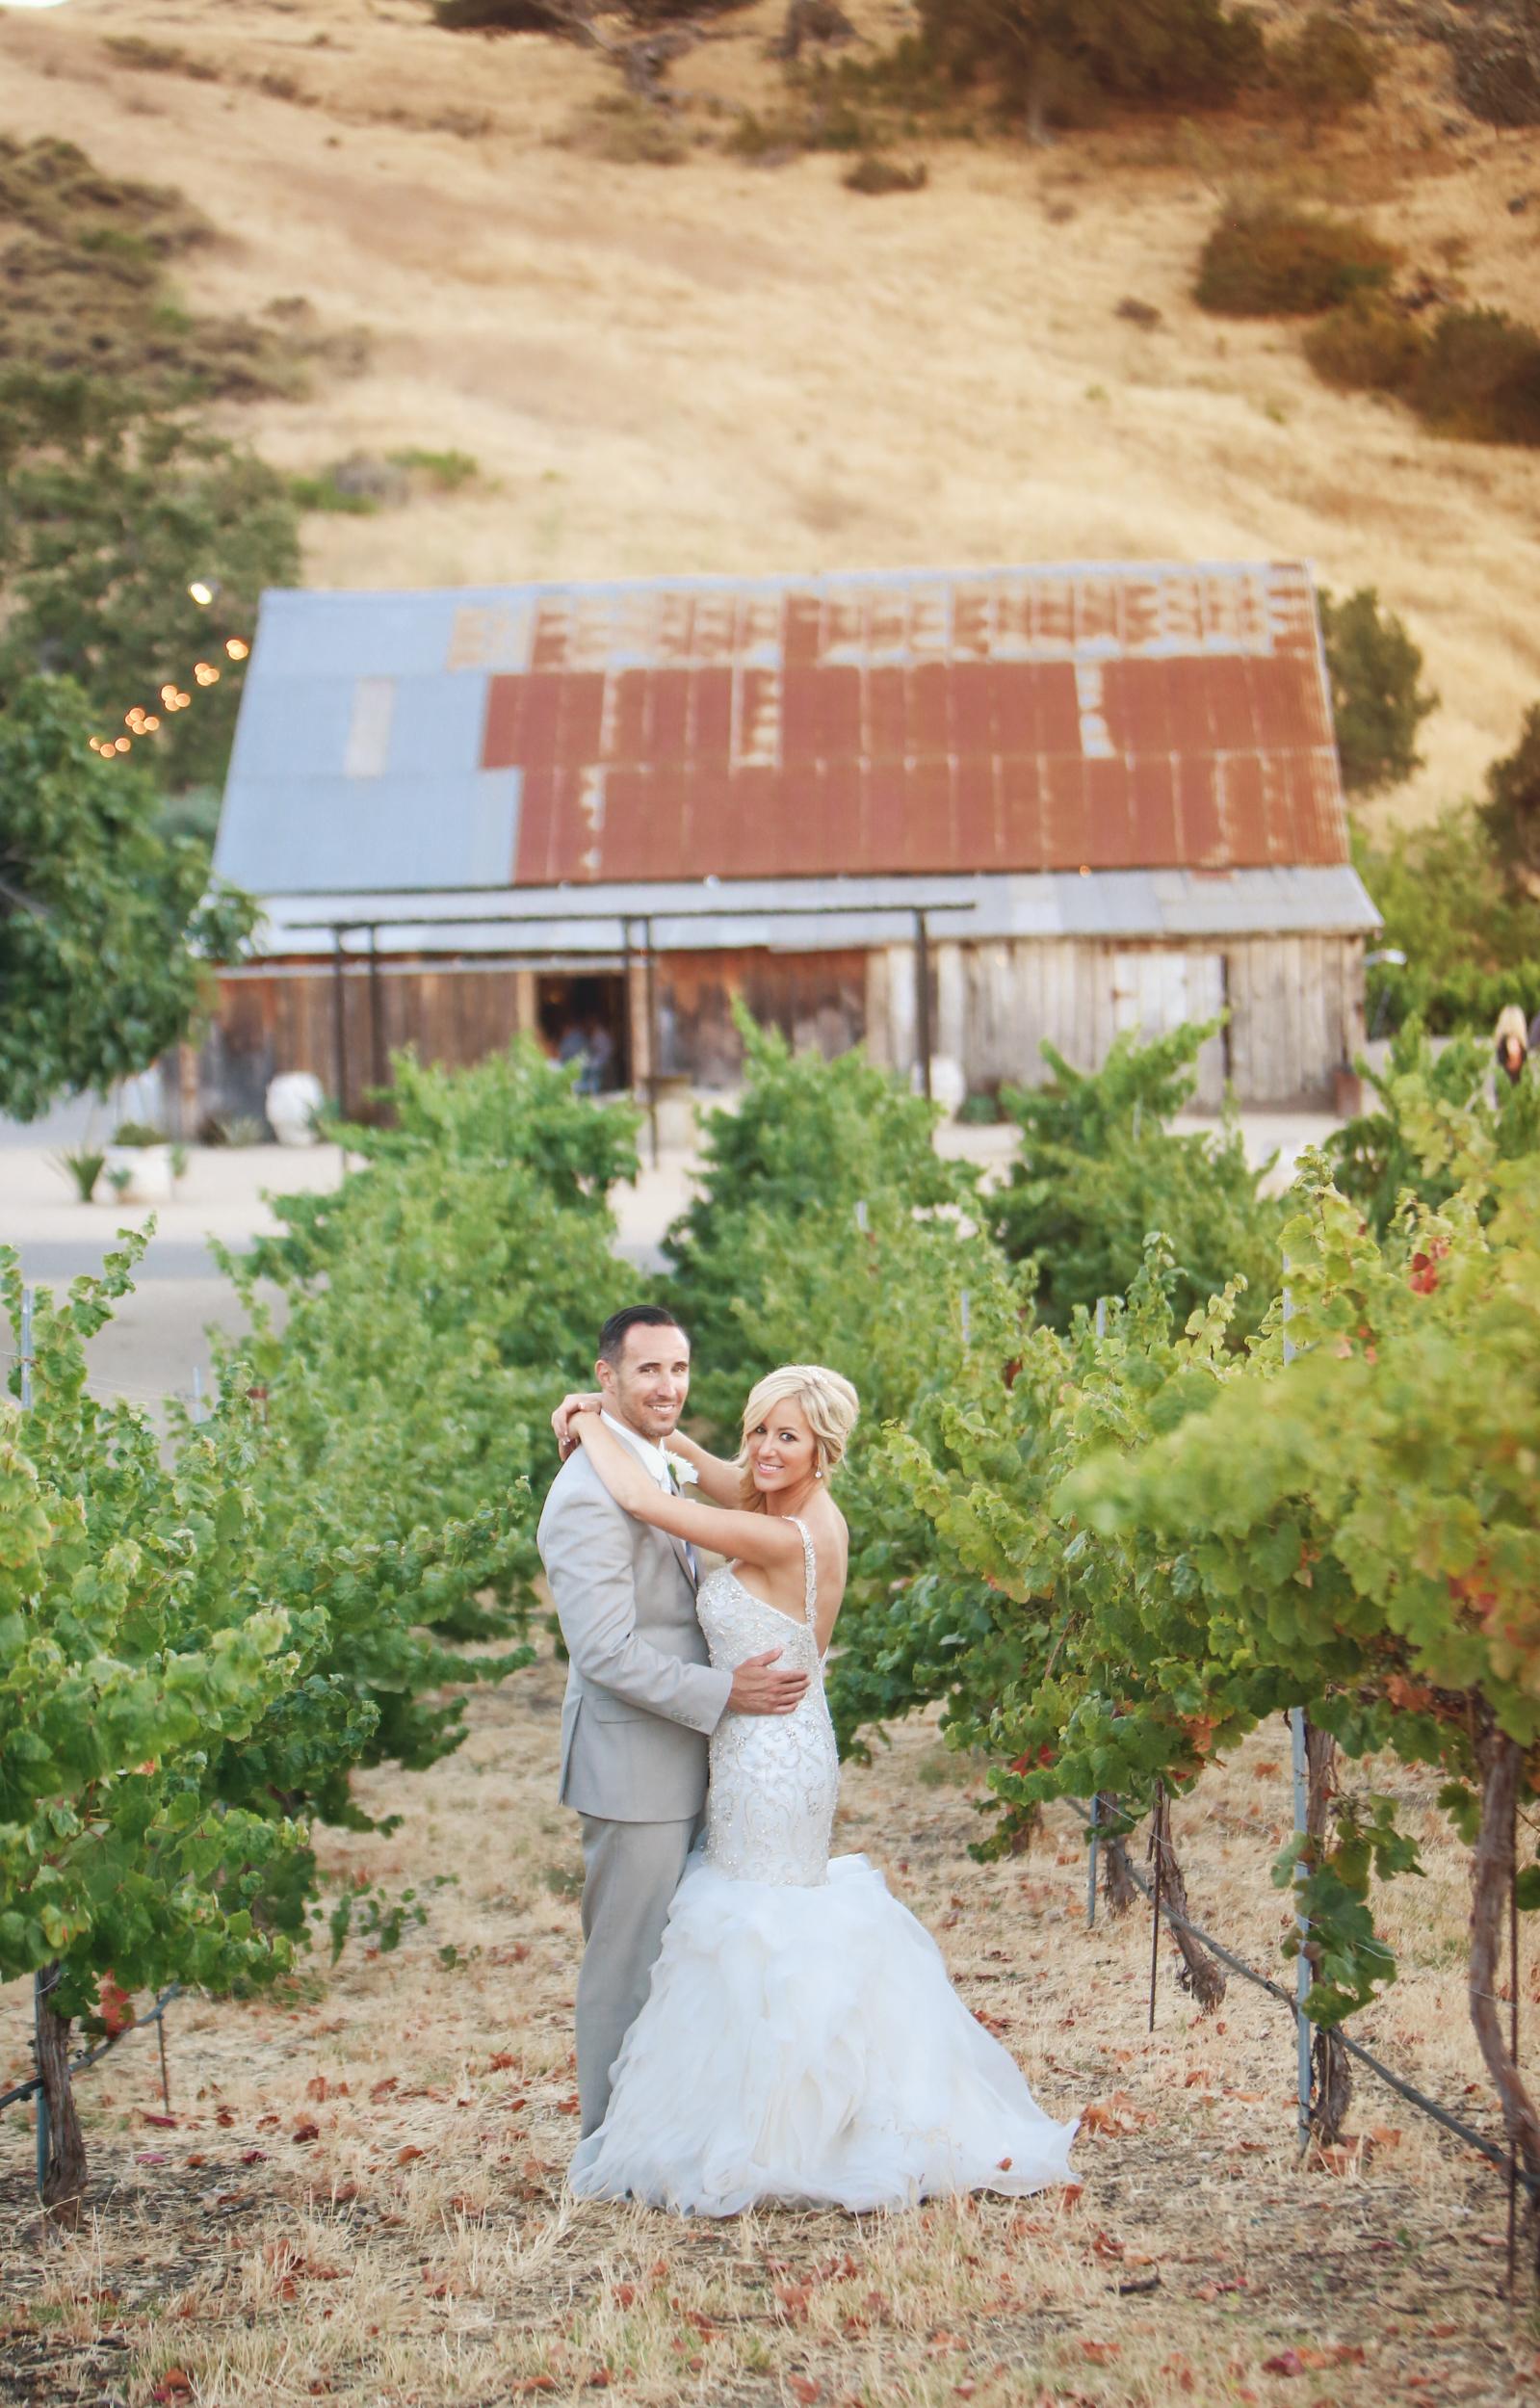 Higuera-Ranch-Wedding-0090.JPG